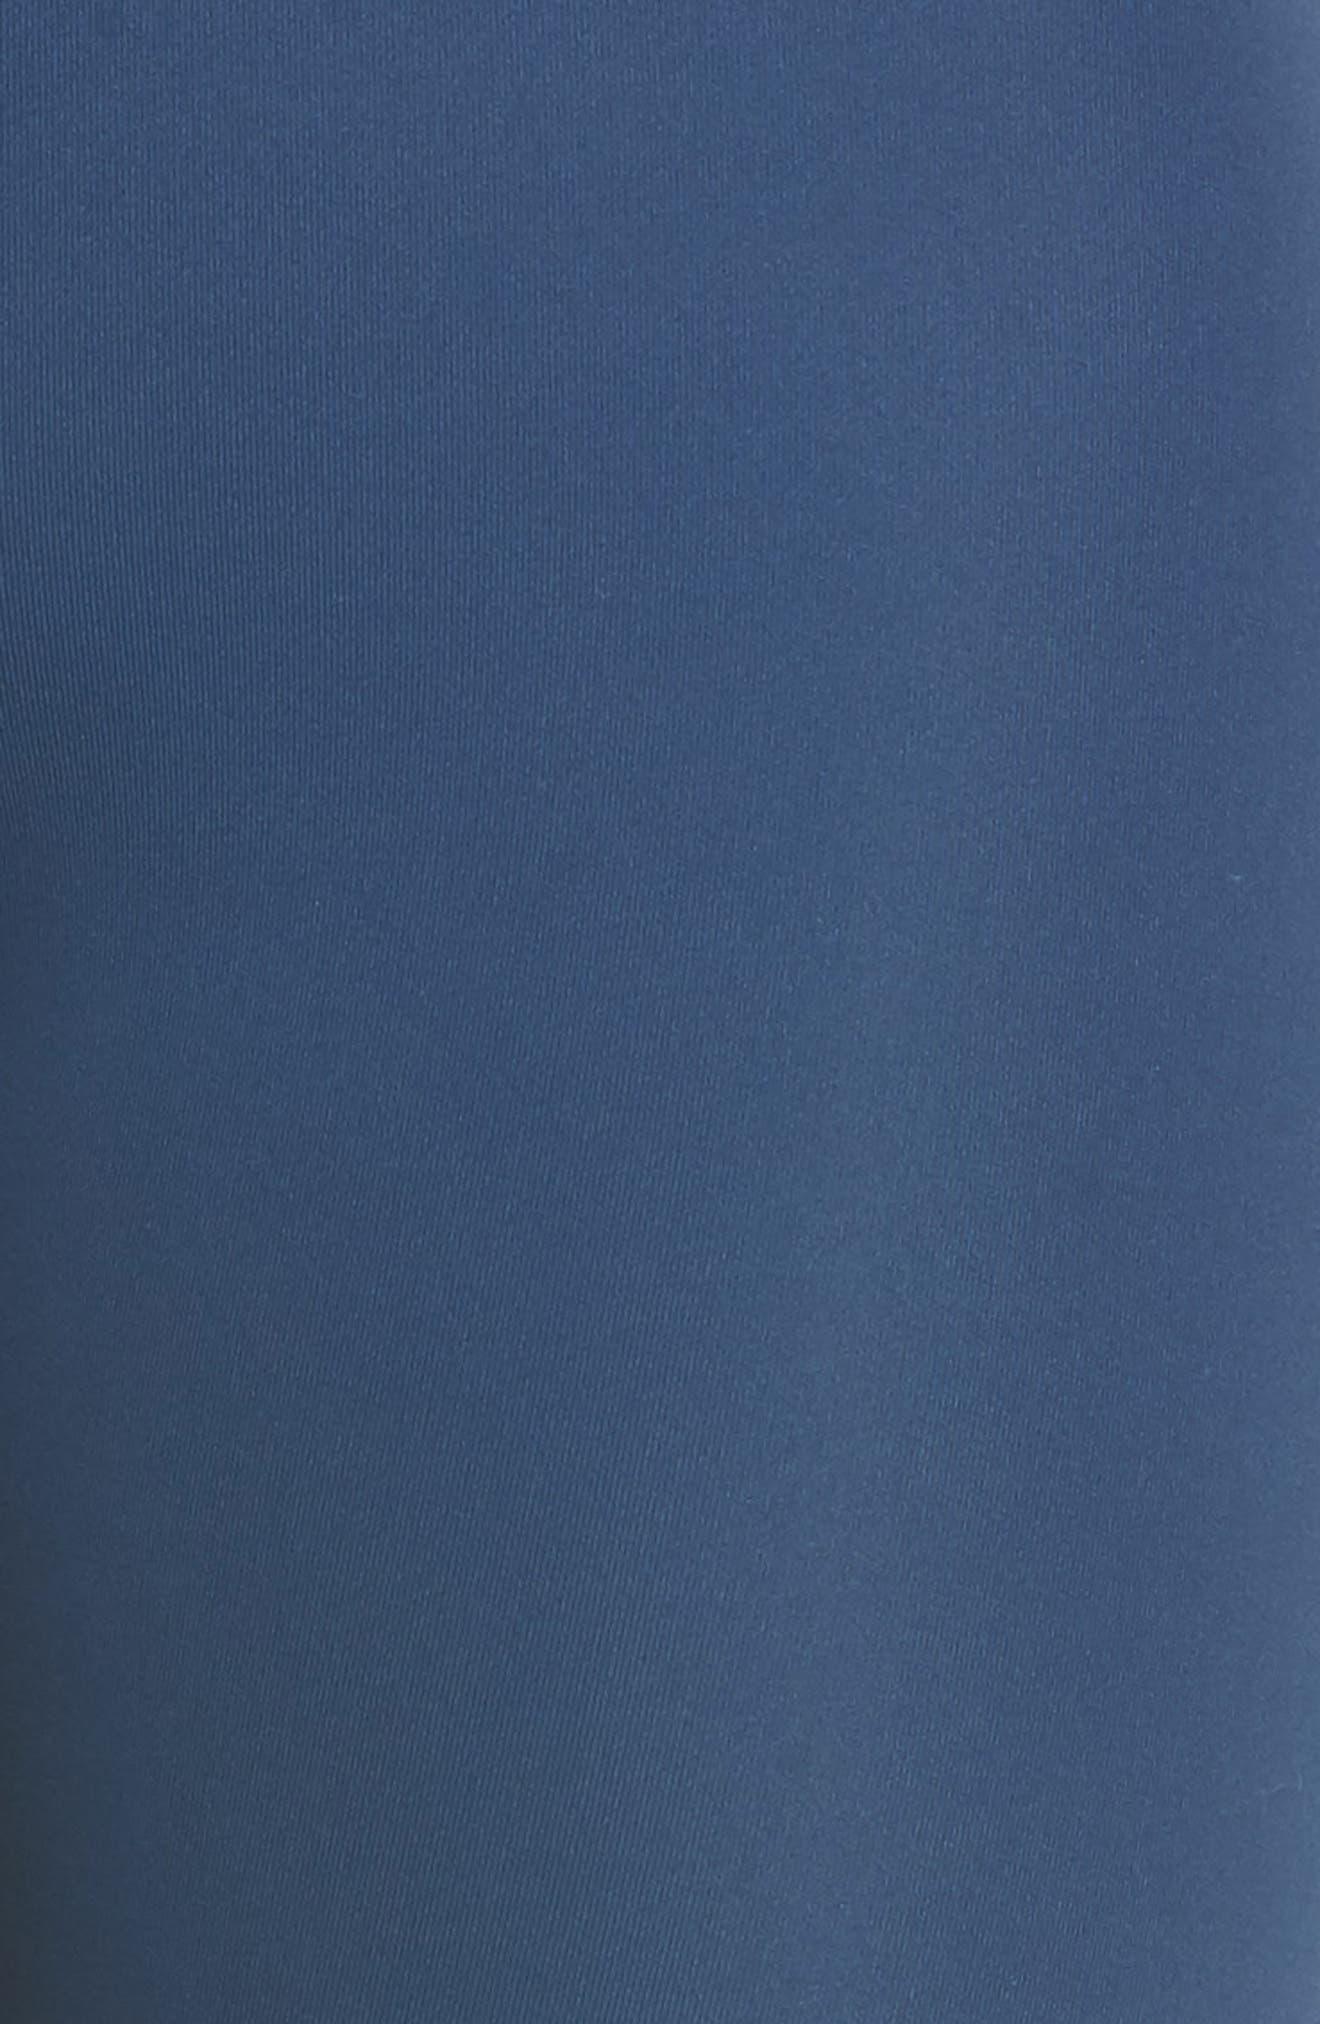 Great Heights Vision High Waist Midi Leggings,                             Alternate thumbnail 5, color,                             Blue Insignia